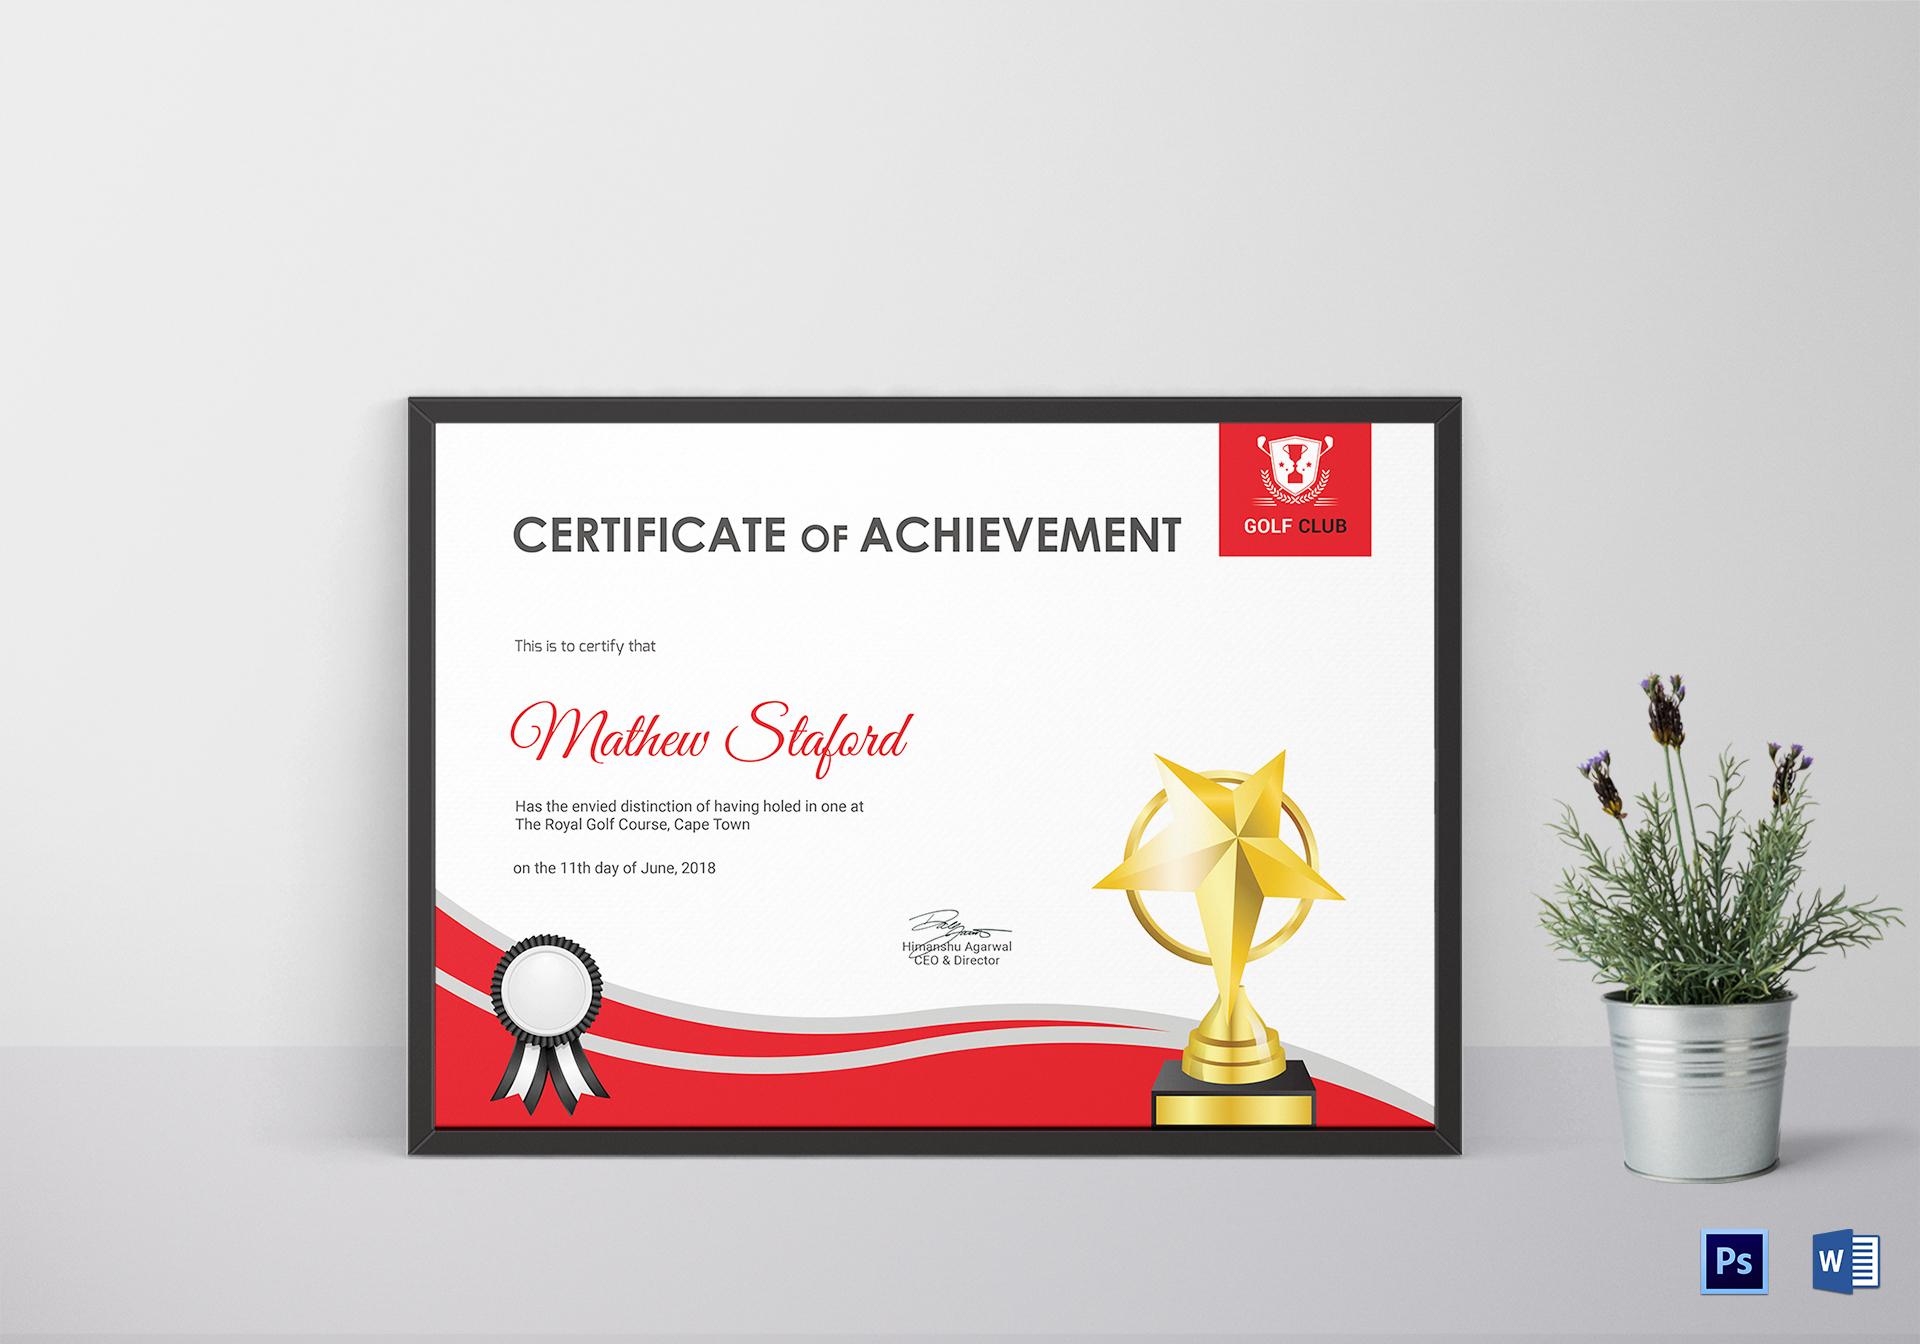 Golf Achievement Certificate Template Pertaining To Golf Certificate Templates For Word